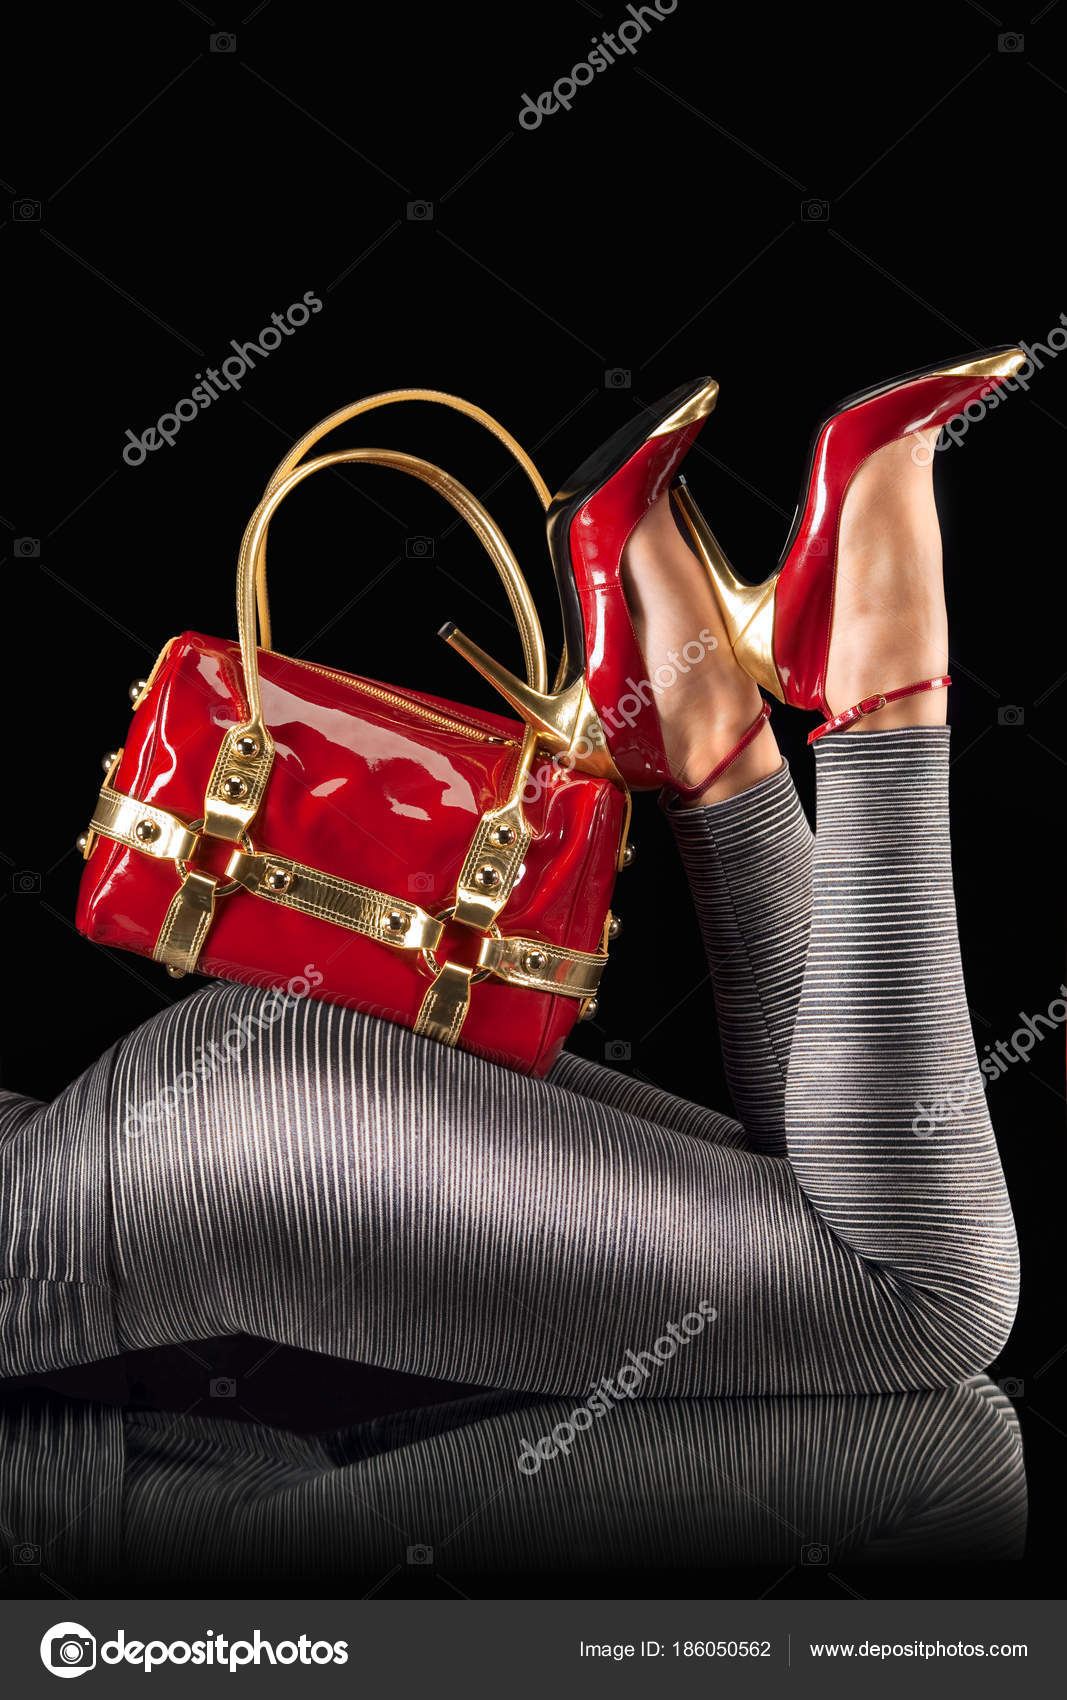 34fa03d18e1 Κόκκινη Τσάντα Και Παπούτσια Ψηλά Τακούνια Για Γυναικεία Οπίσθια ...